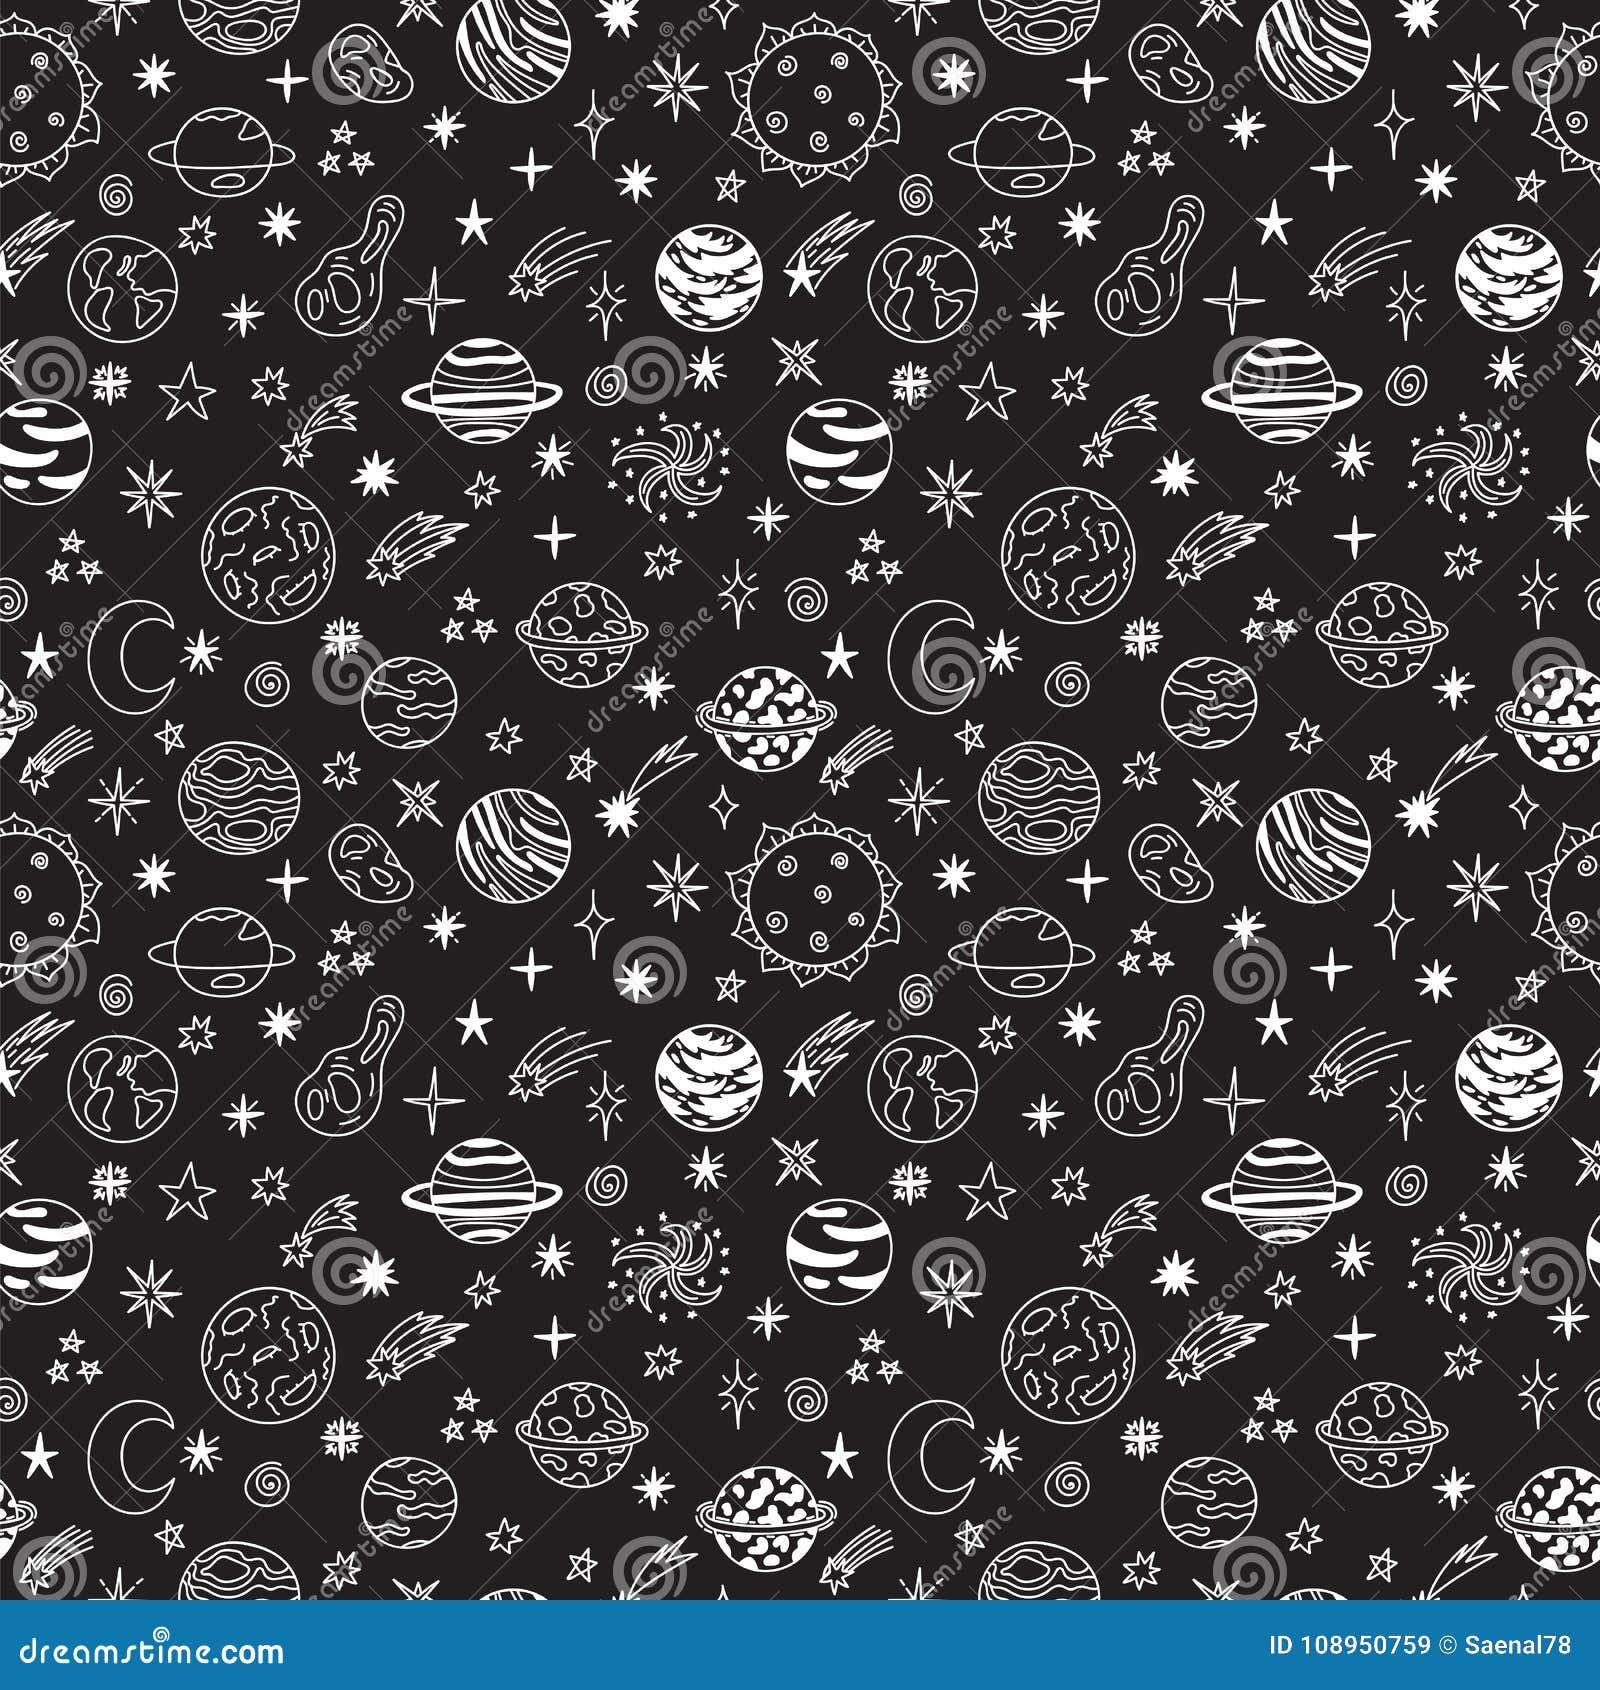 galaxy stars kindergarten worksheets galaxy best free printable worksheets. Black Bedroom Furniture Sets. Home Design Ideas